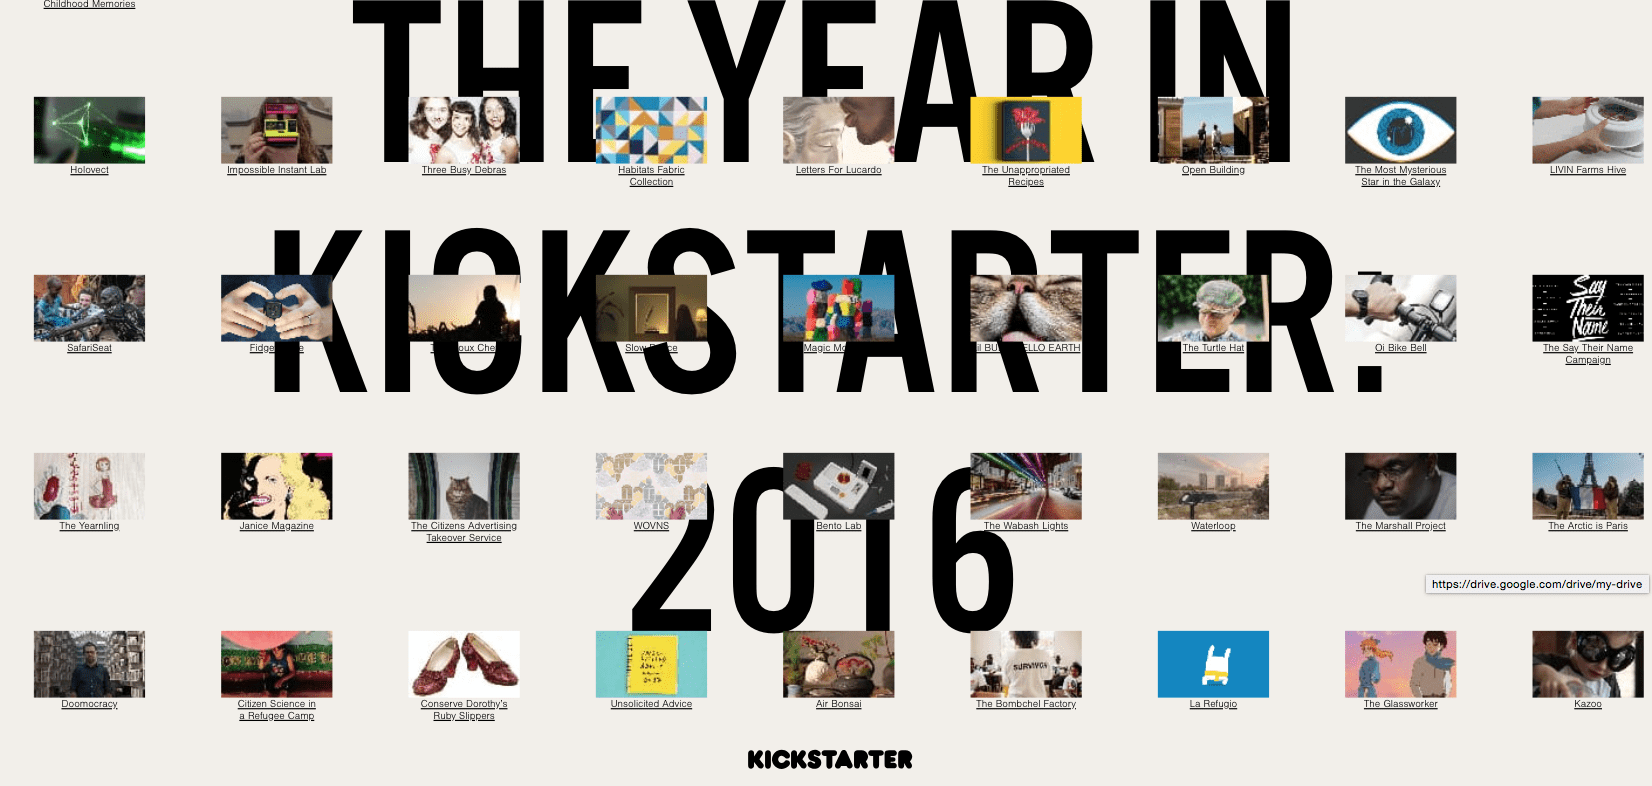 Kickstart 2016 annual report